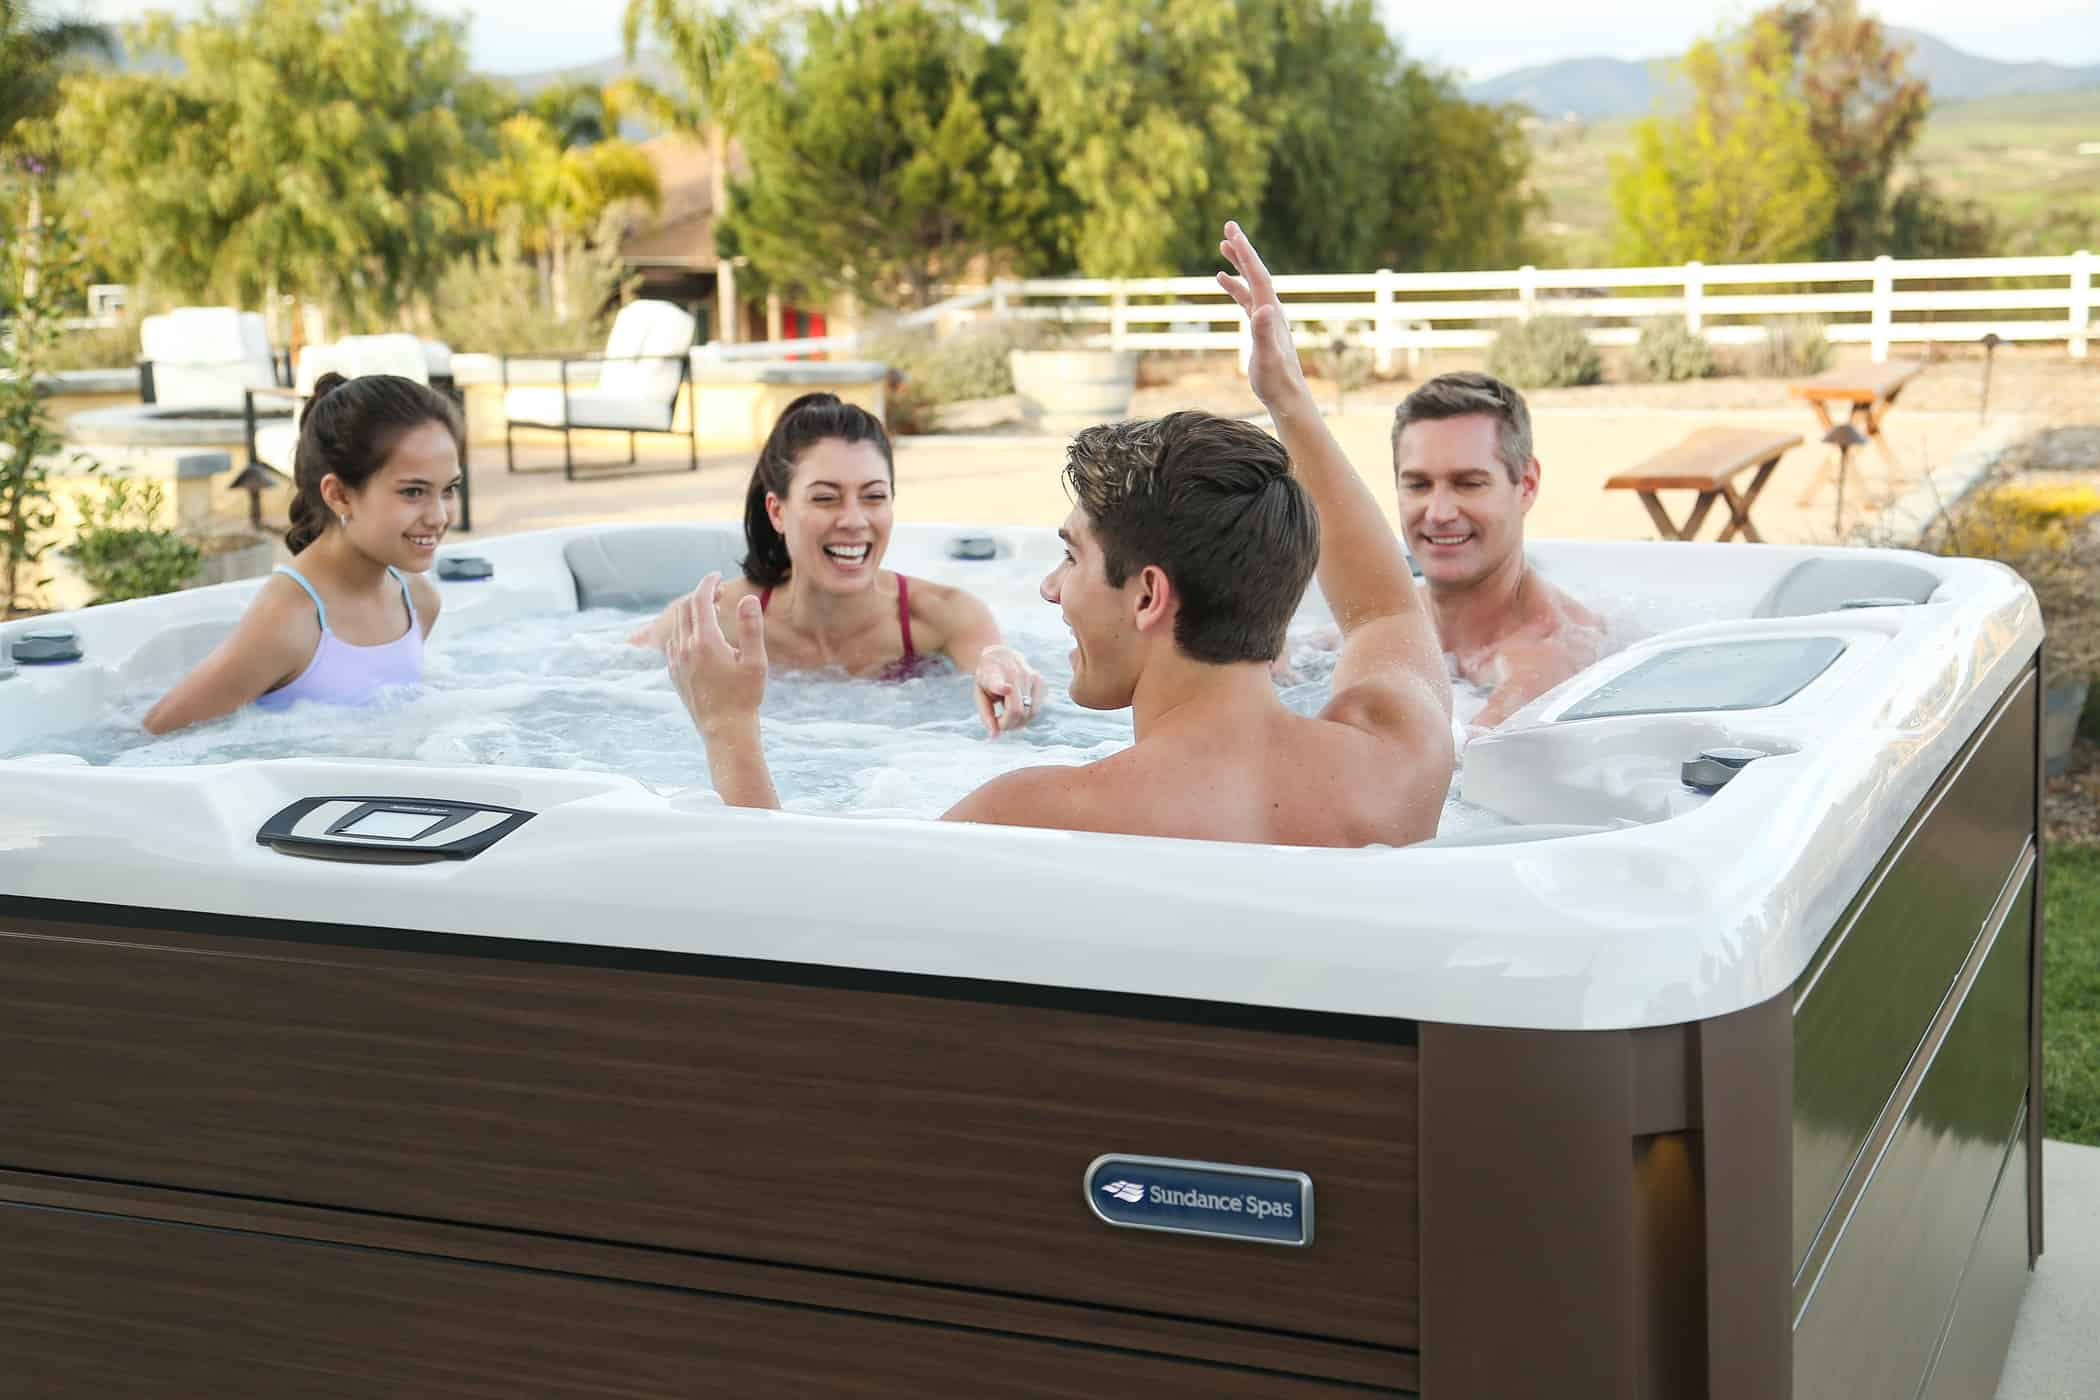 Optima Sundance Spas hot tub installation with happy family inside.